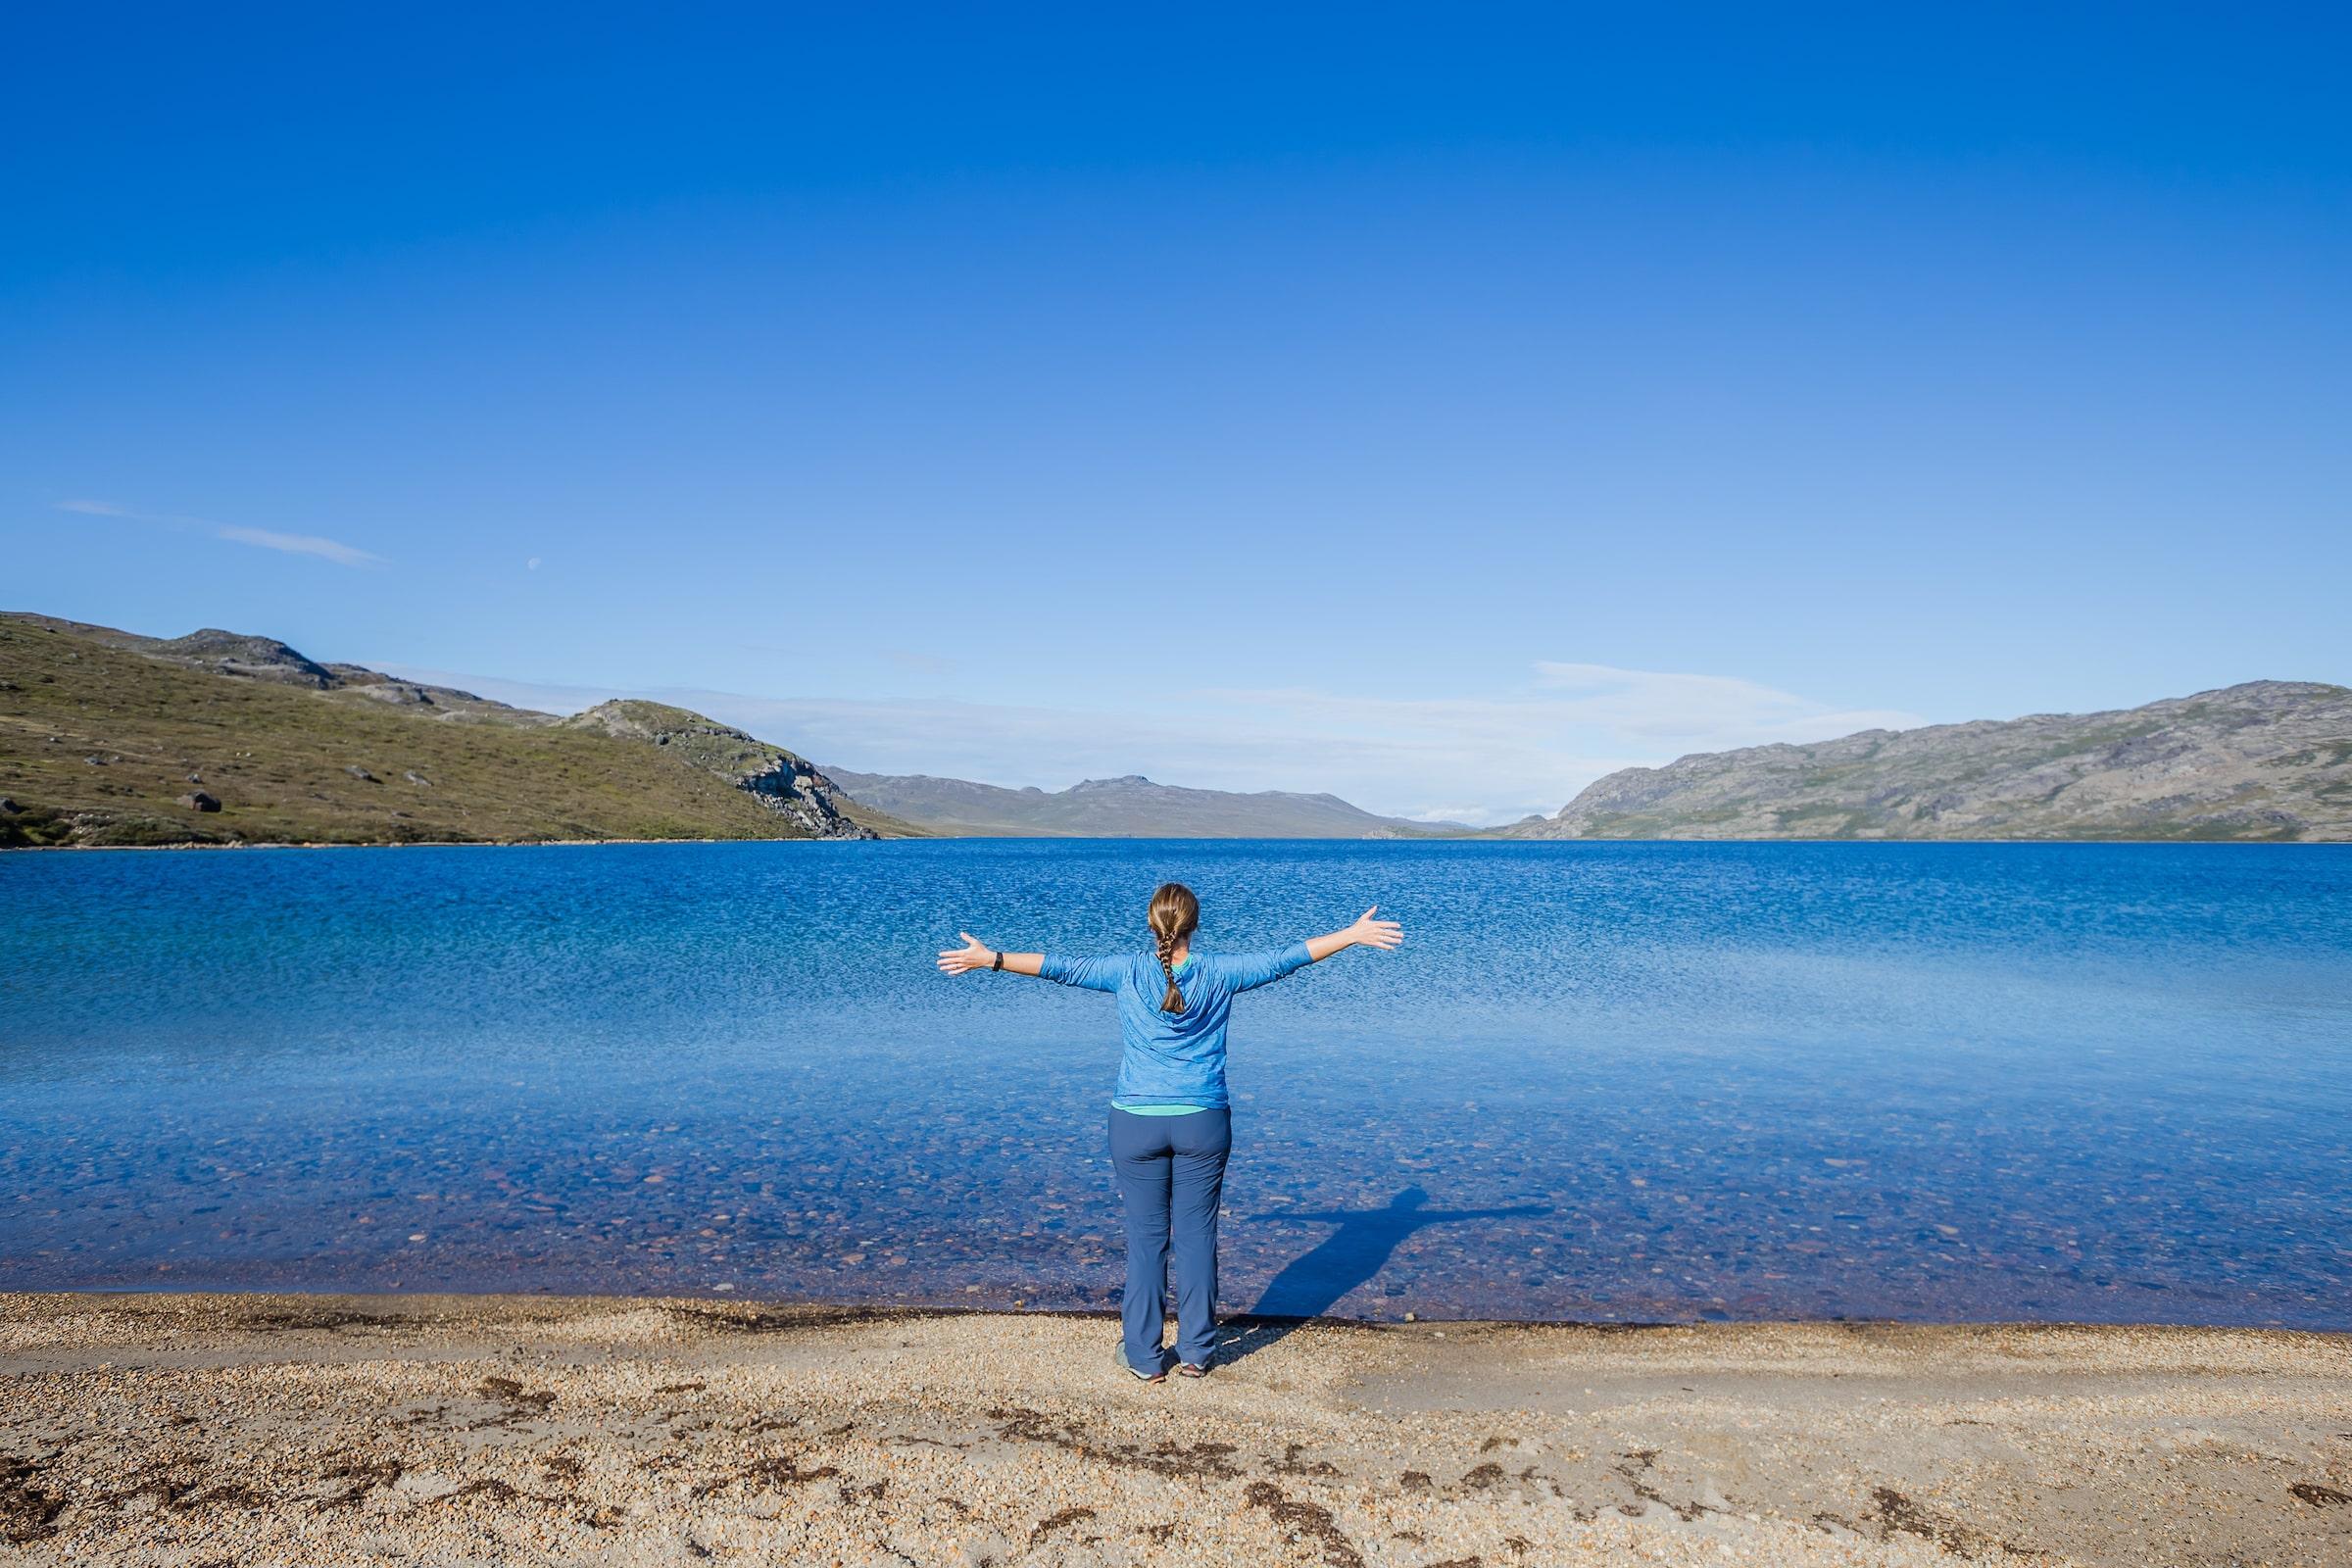 Female hiker enjoying the scenery at Amitsorsuaq Lake along the Arctic Circle Trail. Photo by Lina Stock - Visit Greenland